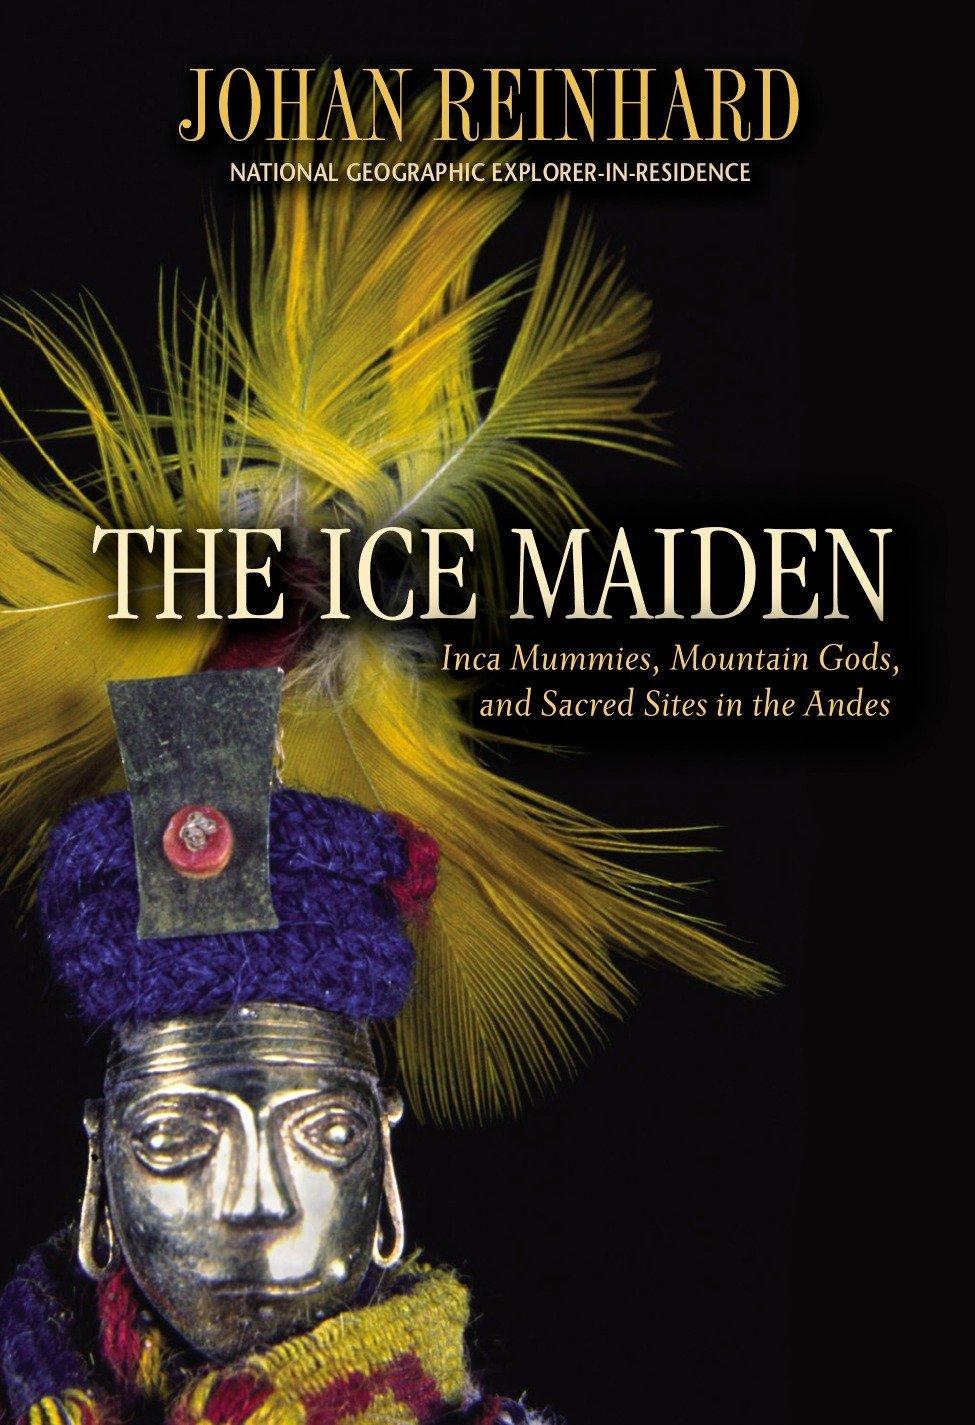 The Ice Maiden: Inca Mummies, Mountain Gods, and